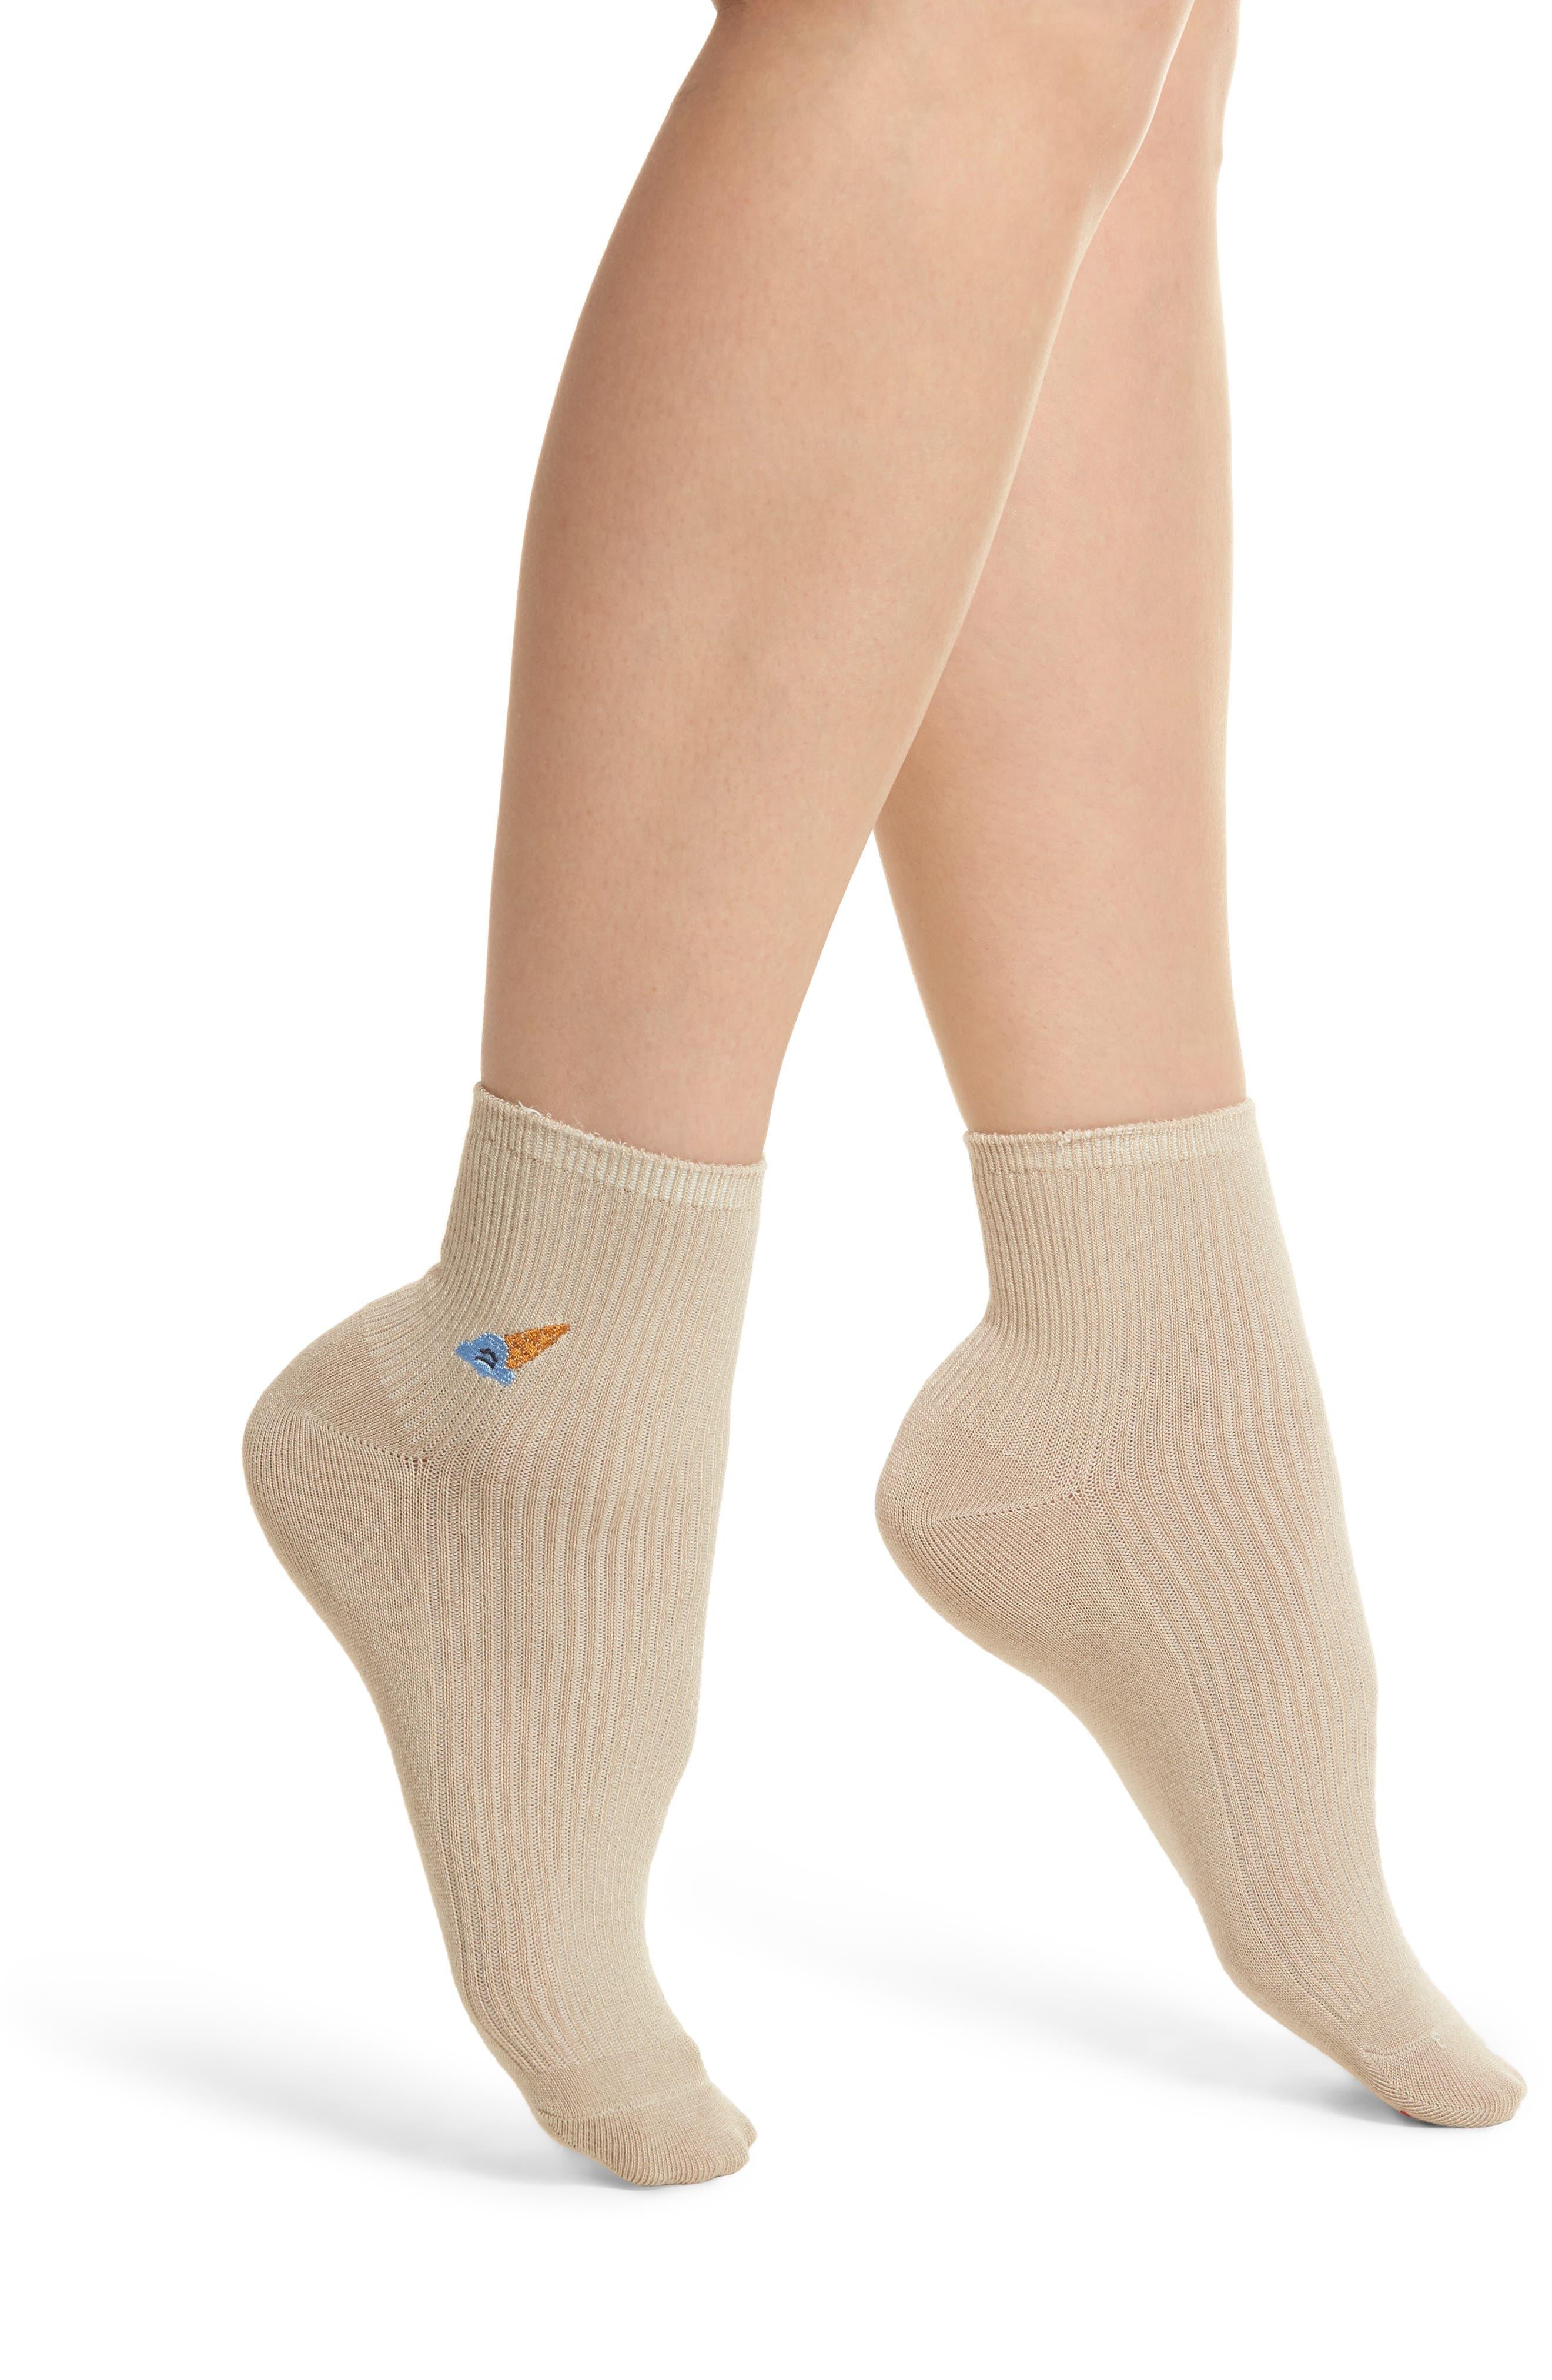 Coney Ankle Socks,                             Main thumbnail 1, color,                             Oatmeal